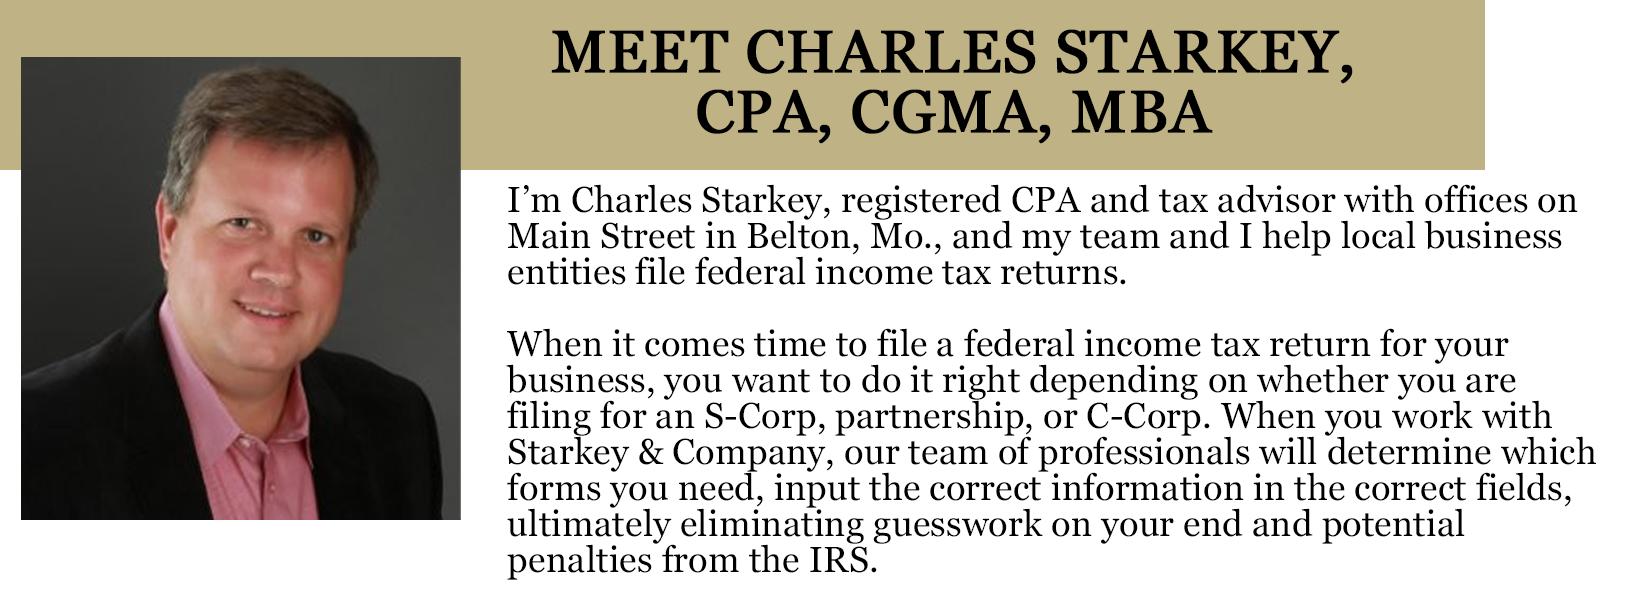 About Charles Starkey